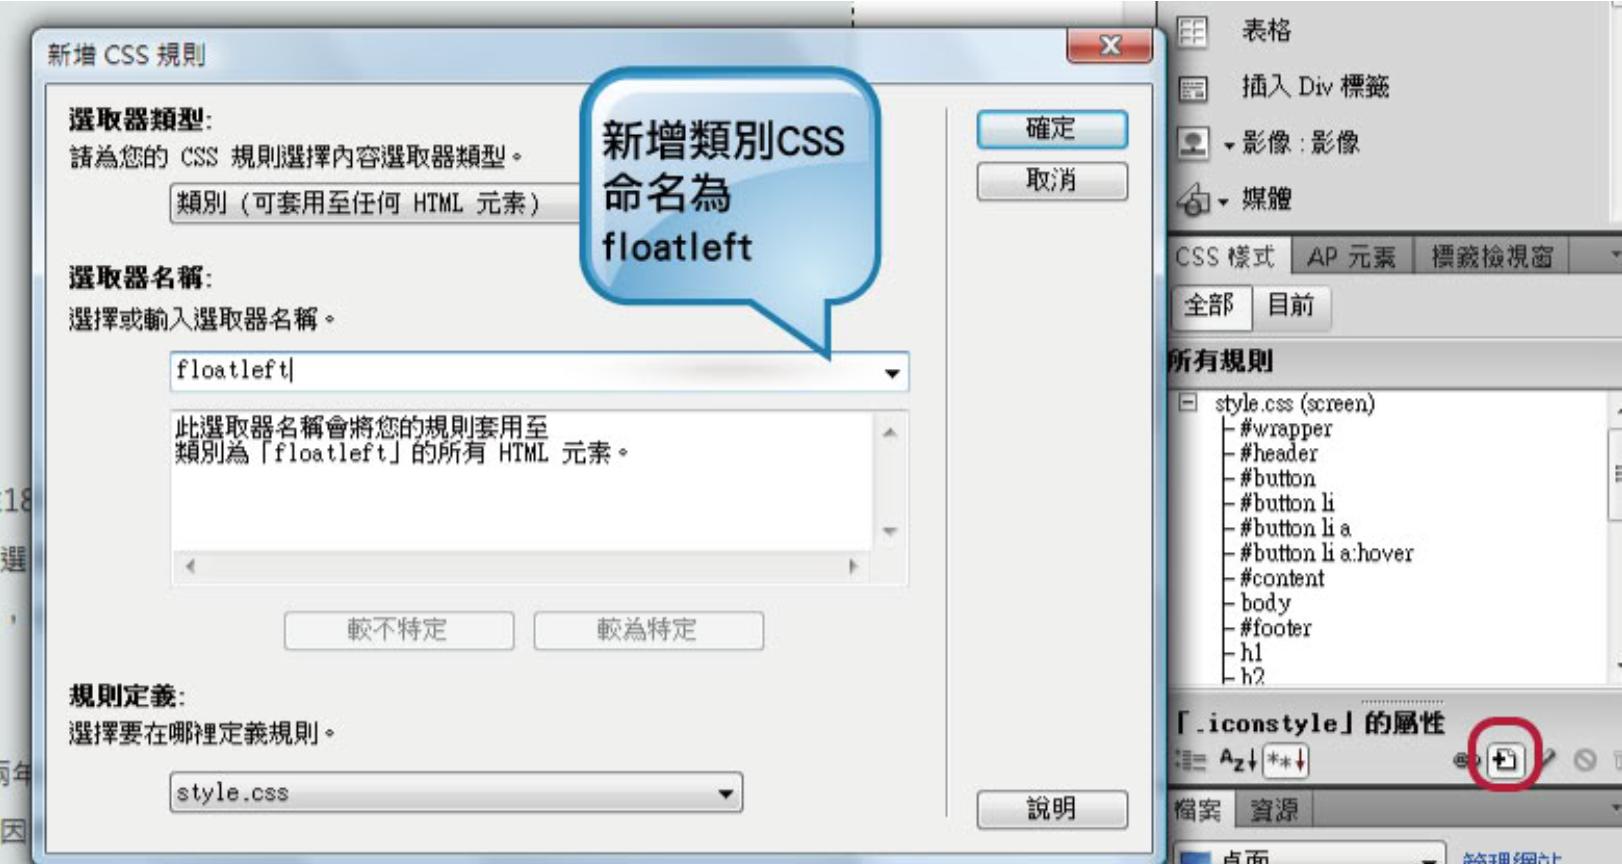 http://mepopedia.com/~jinjin/web/img/504.png